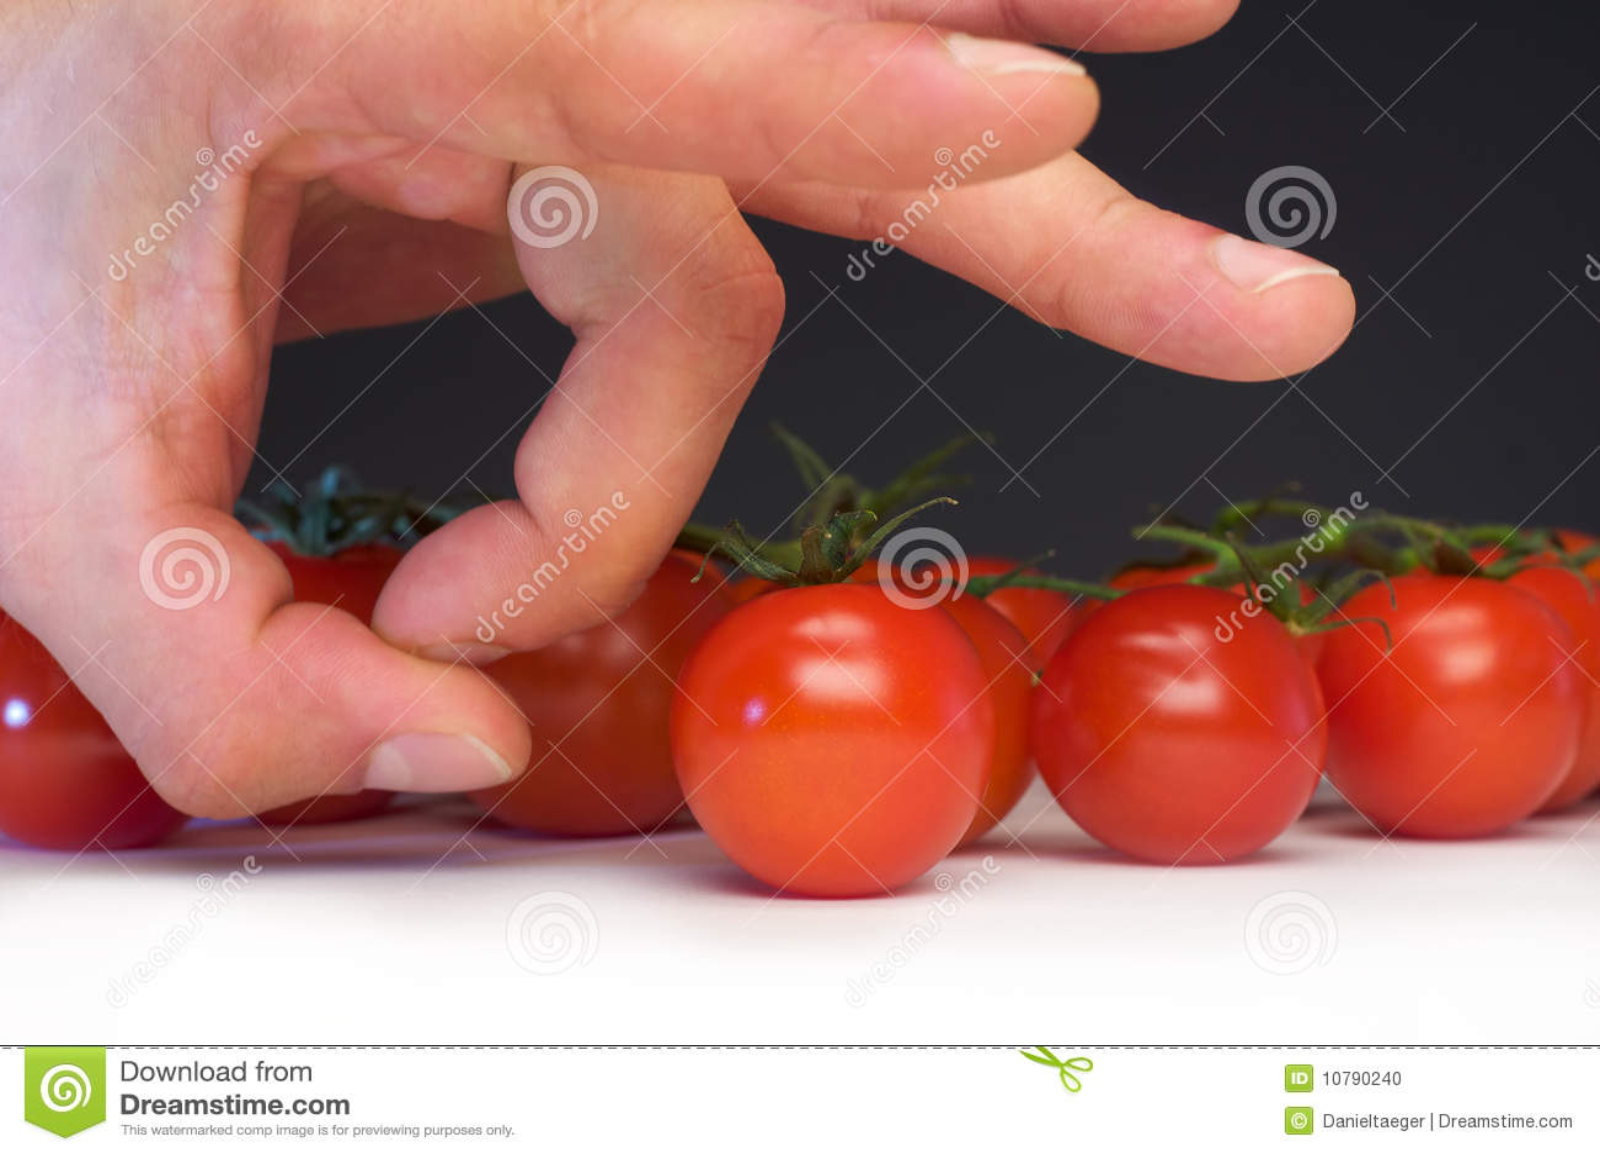 Snip pomidor